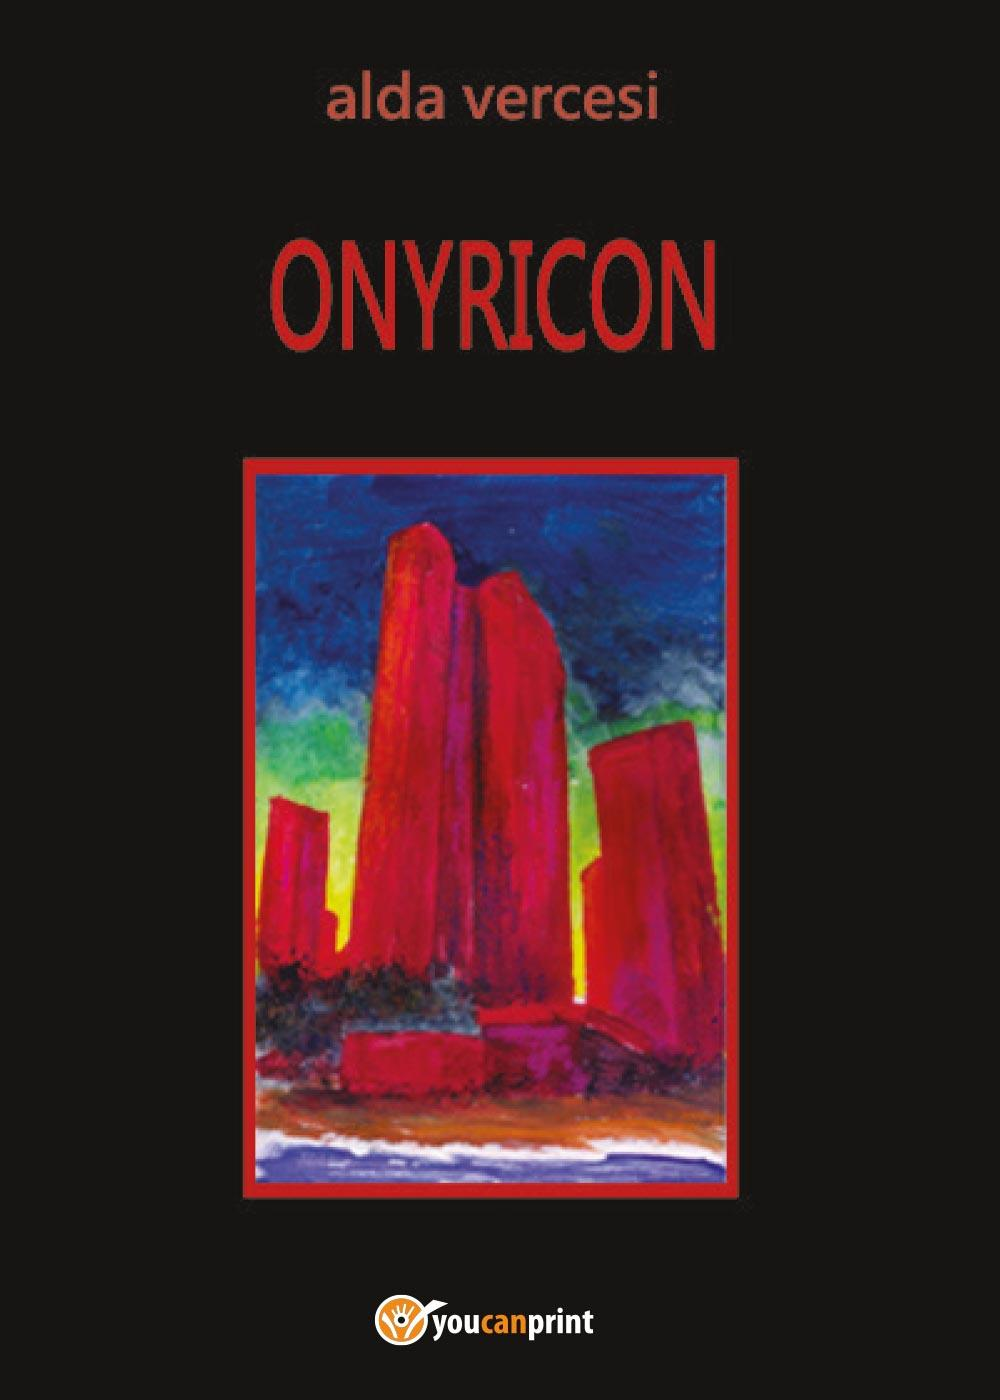 Onyricon